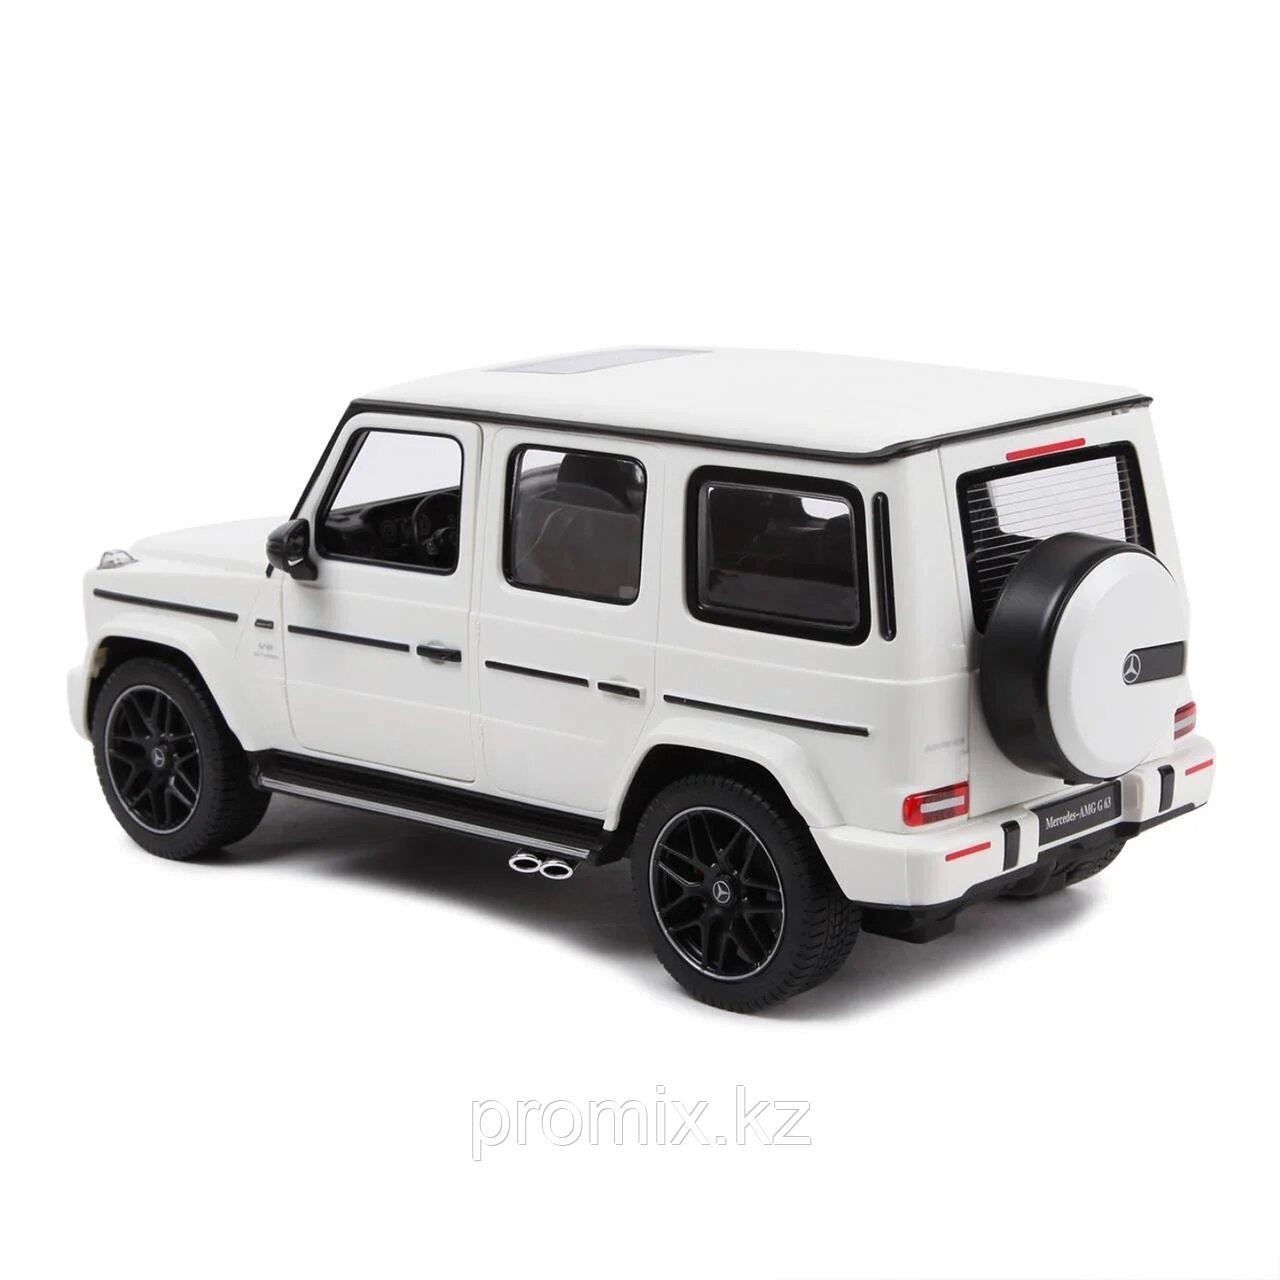 Радиоуправляемая машина Rastar Mercedes-Benz AMG G63, 1:14, White - фото 2